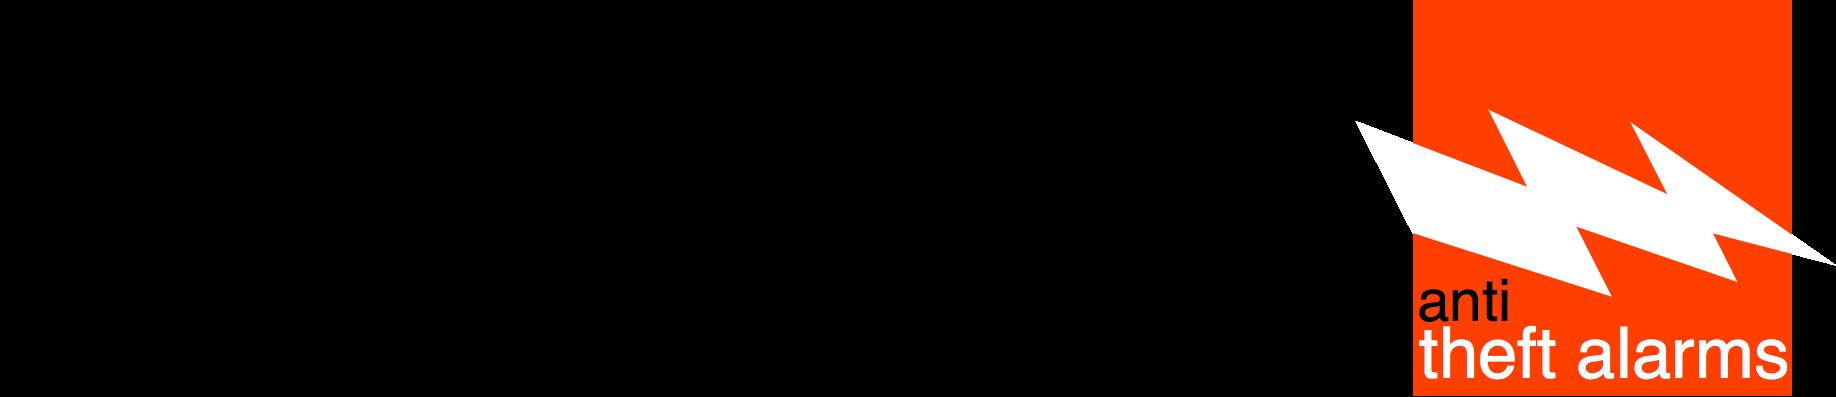 sonic-shock-logo 2018 flash 300dpi groot